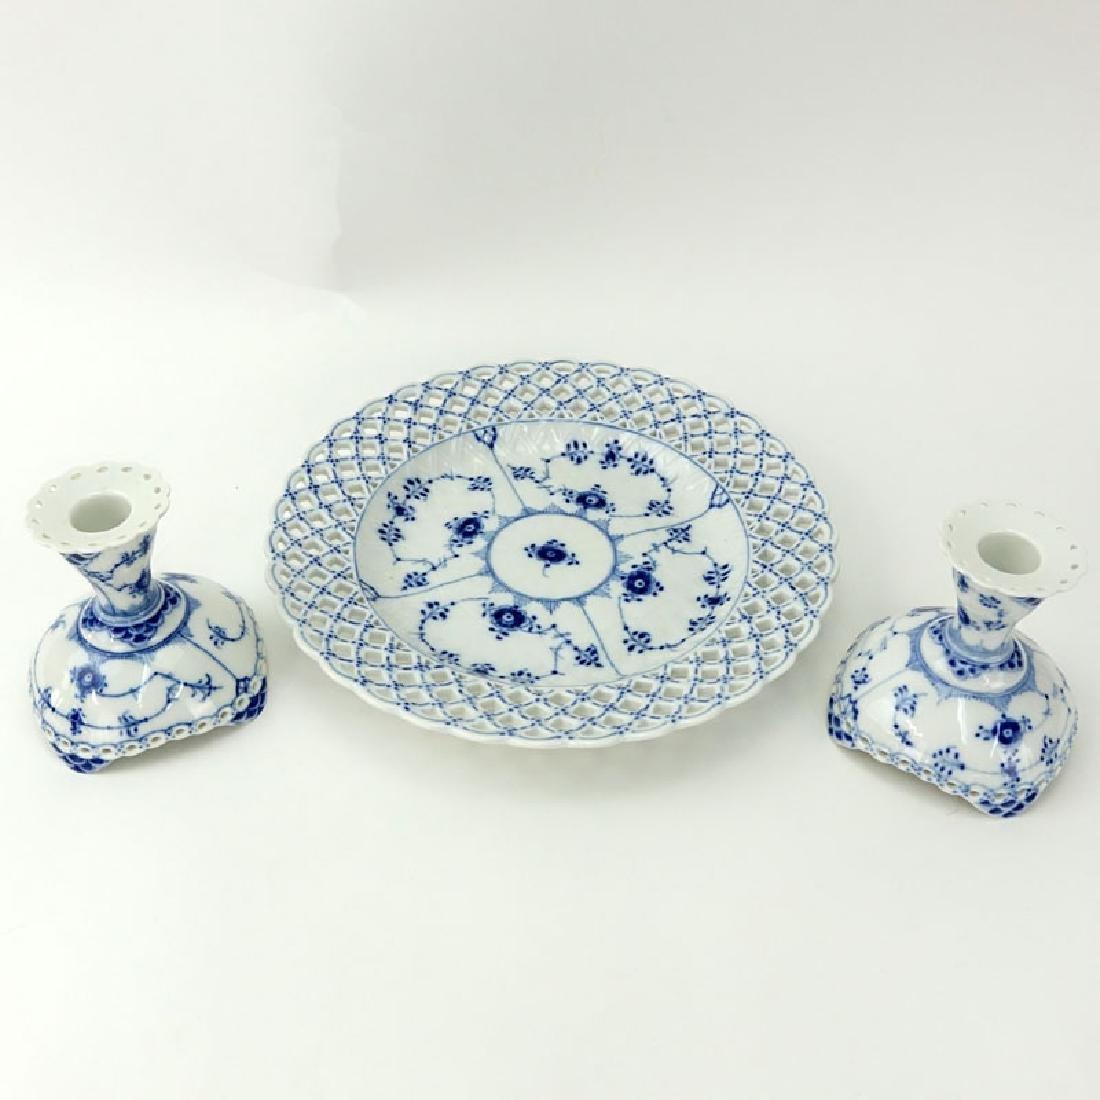 Three Piece Royal Copenhagen Table Top Items